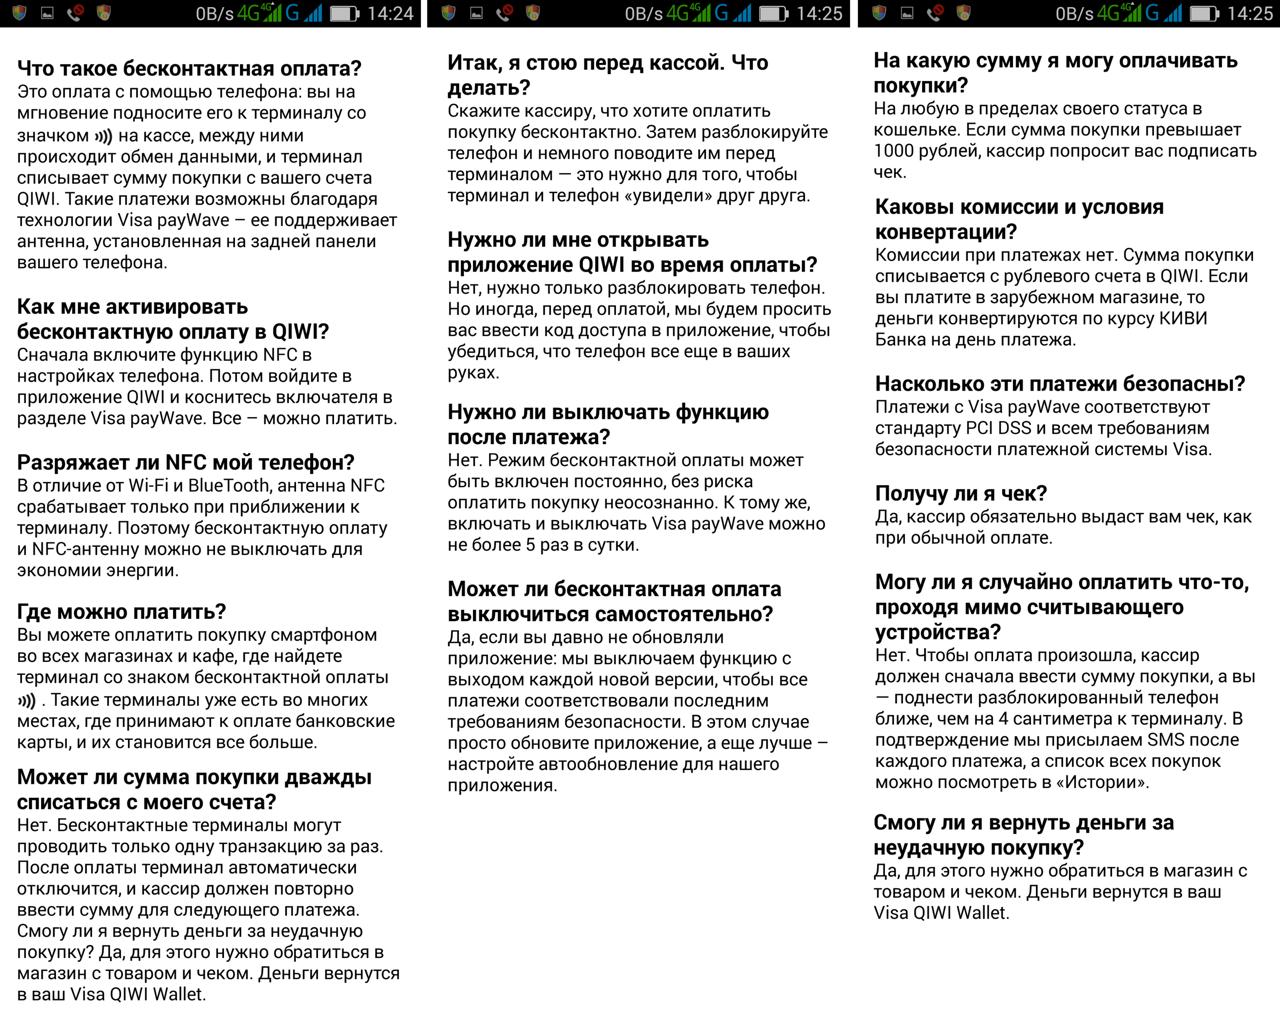 https://img-fotki.yandex.ru/get/94372/80747186.4/0_17ee42_e5f49478_X4L.png